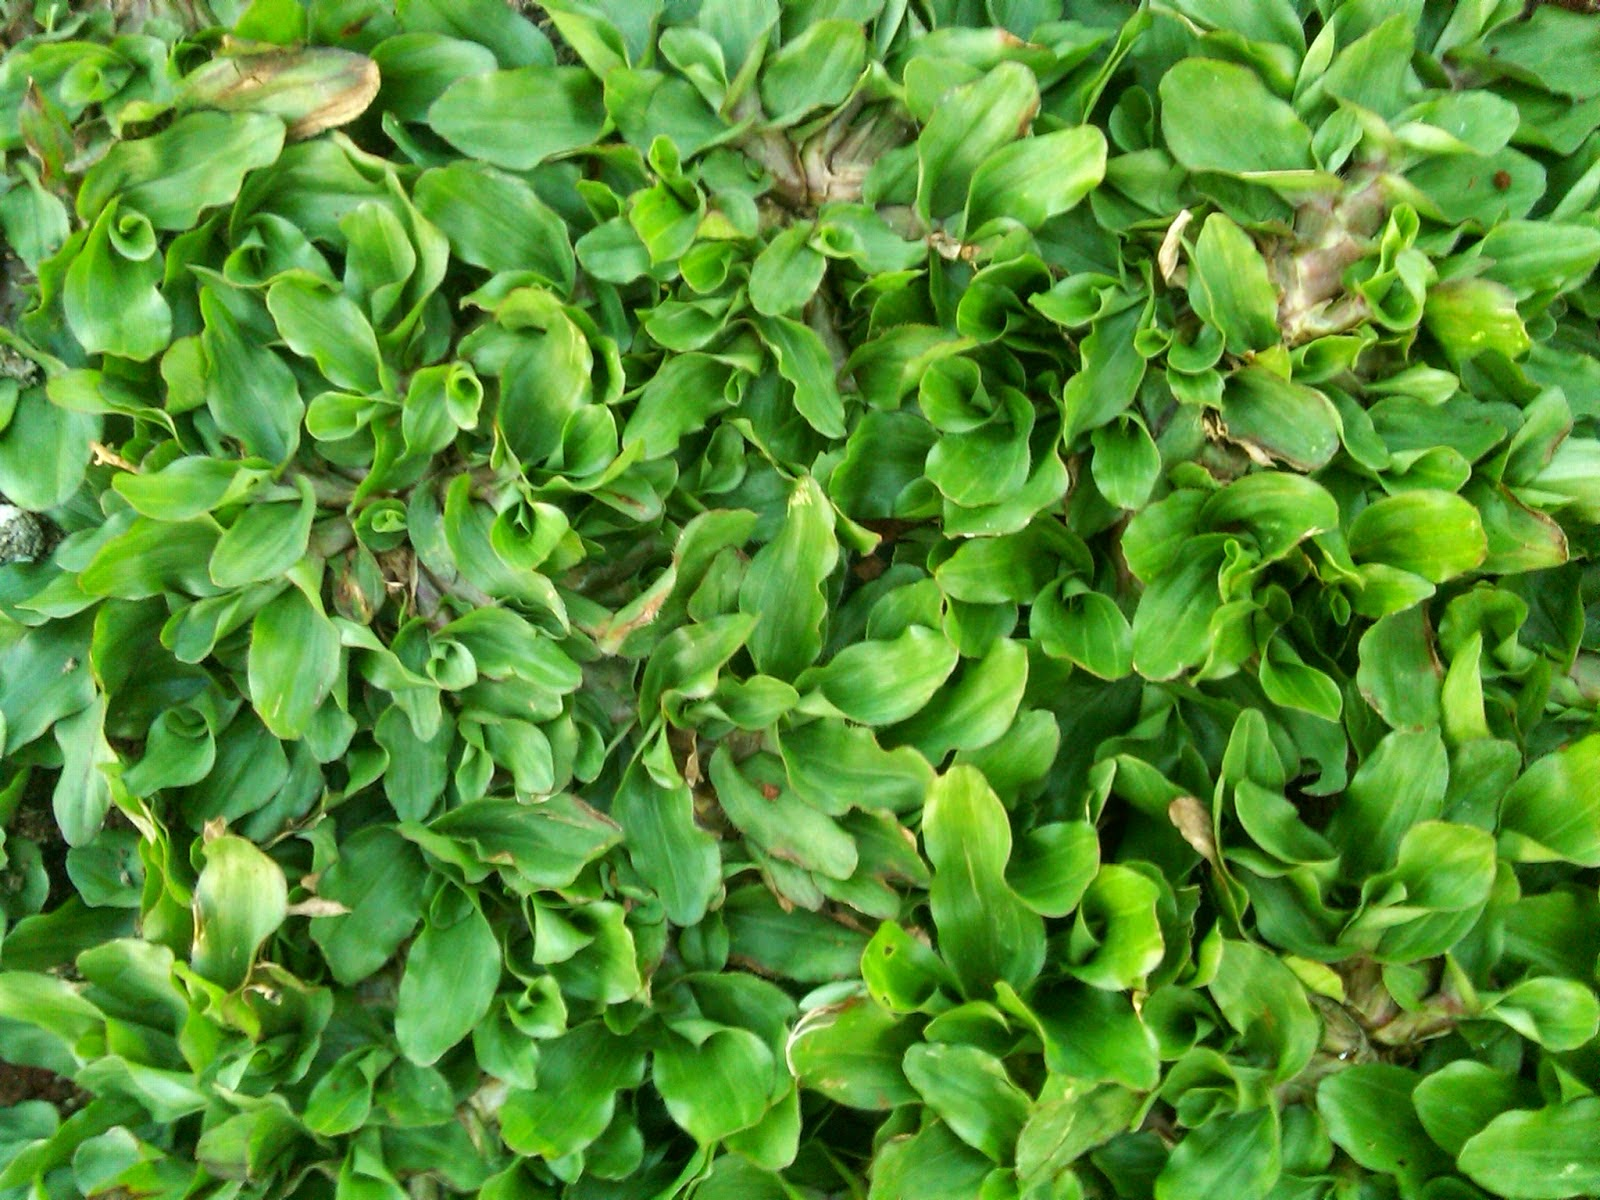 Jual rumput gajah mini super lentik  | jasa tanam rumput | jasa desain taman | suplier tanaman